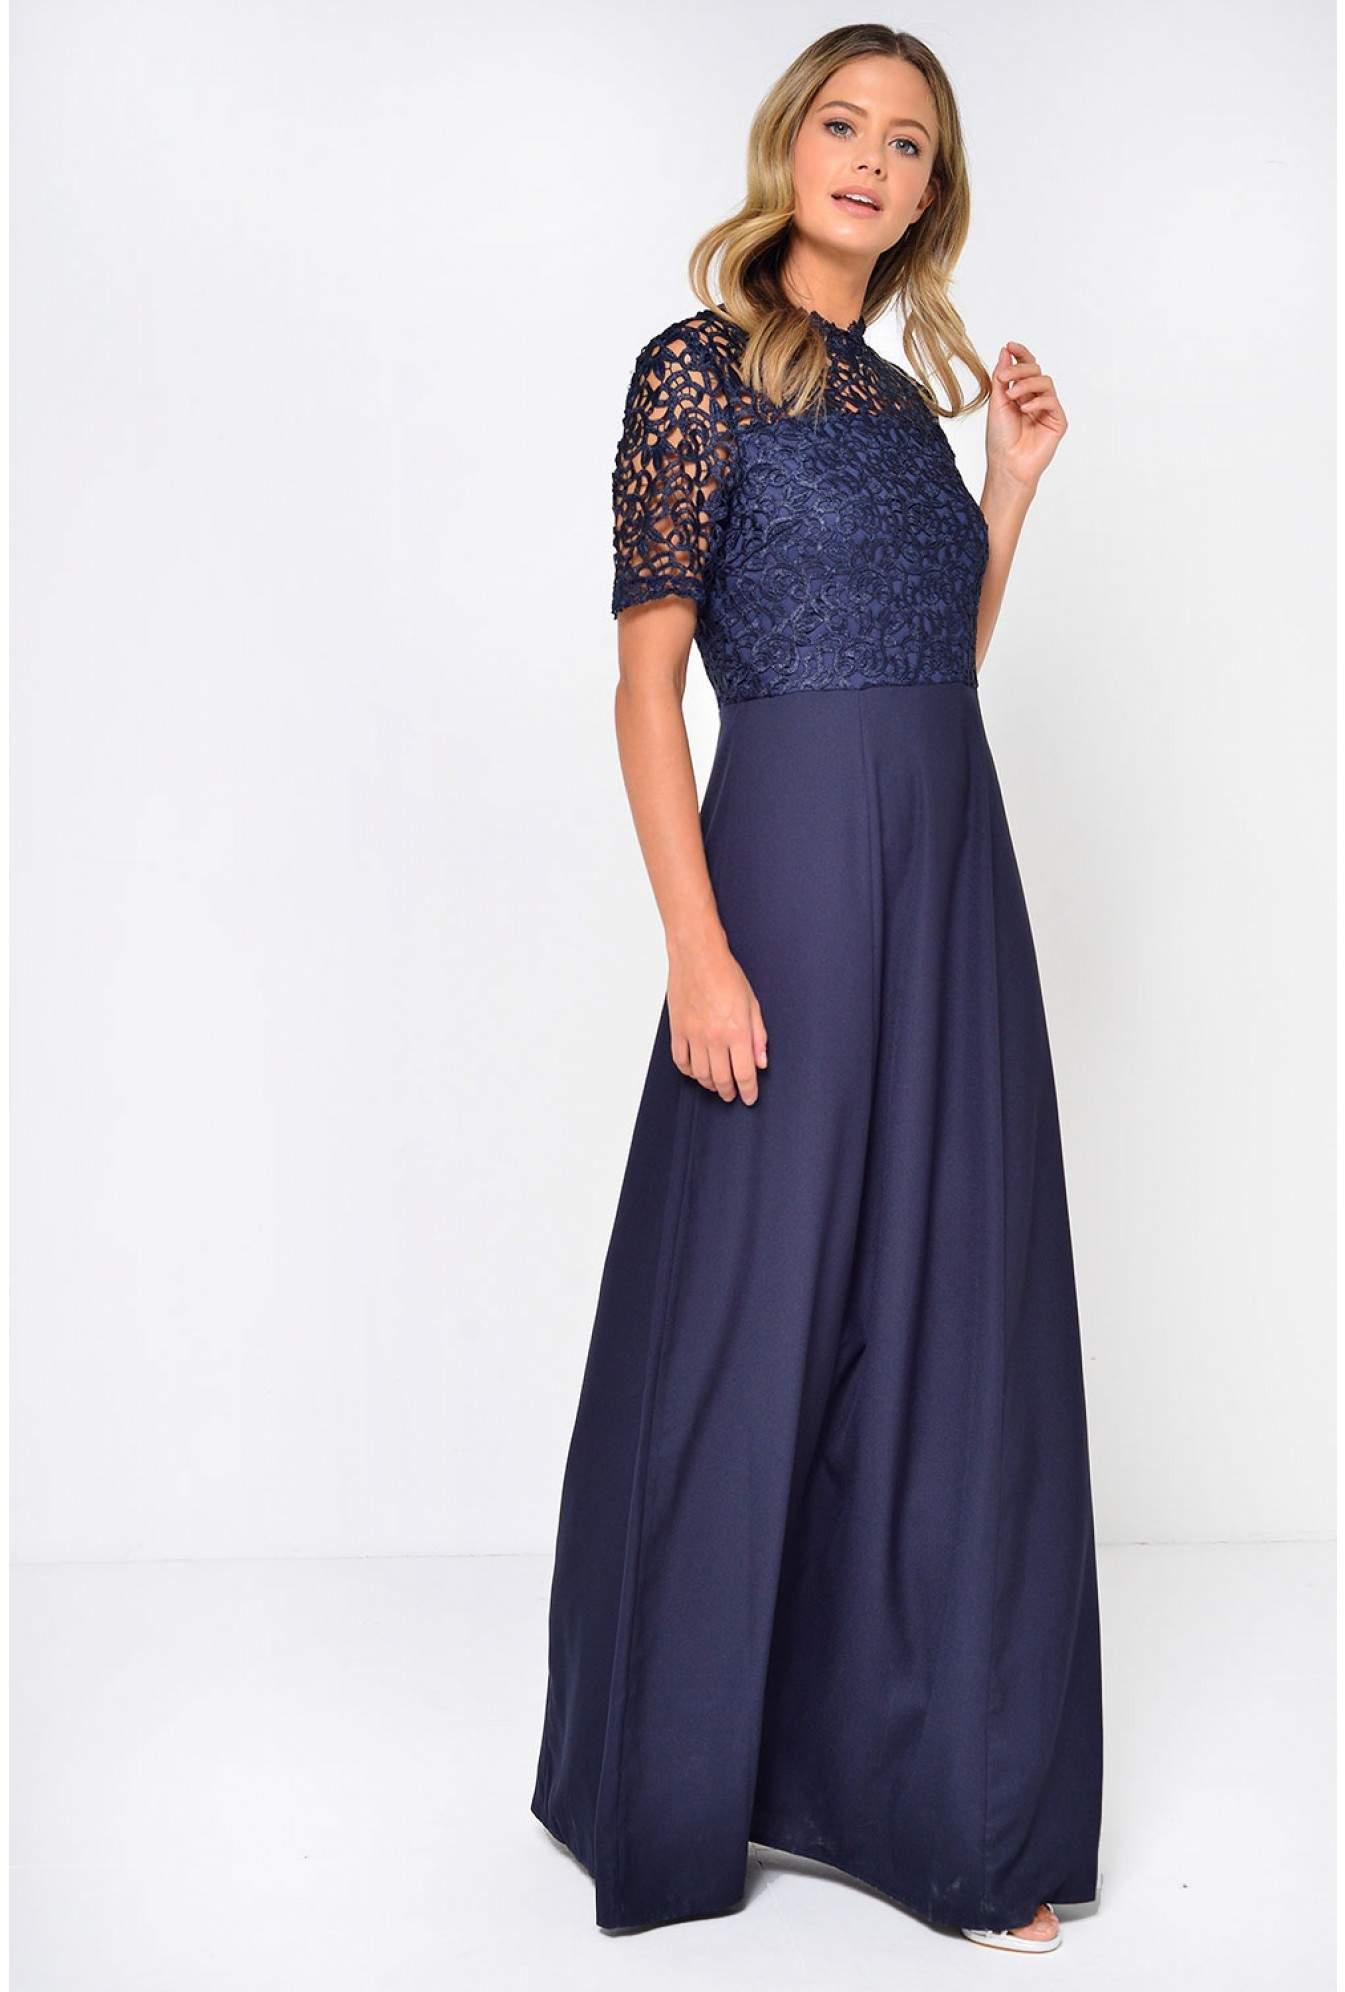 8c857f2f23f Navy Crochet Top Maxi Dress